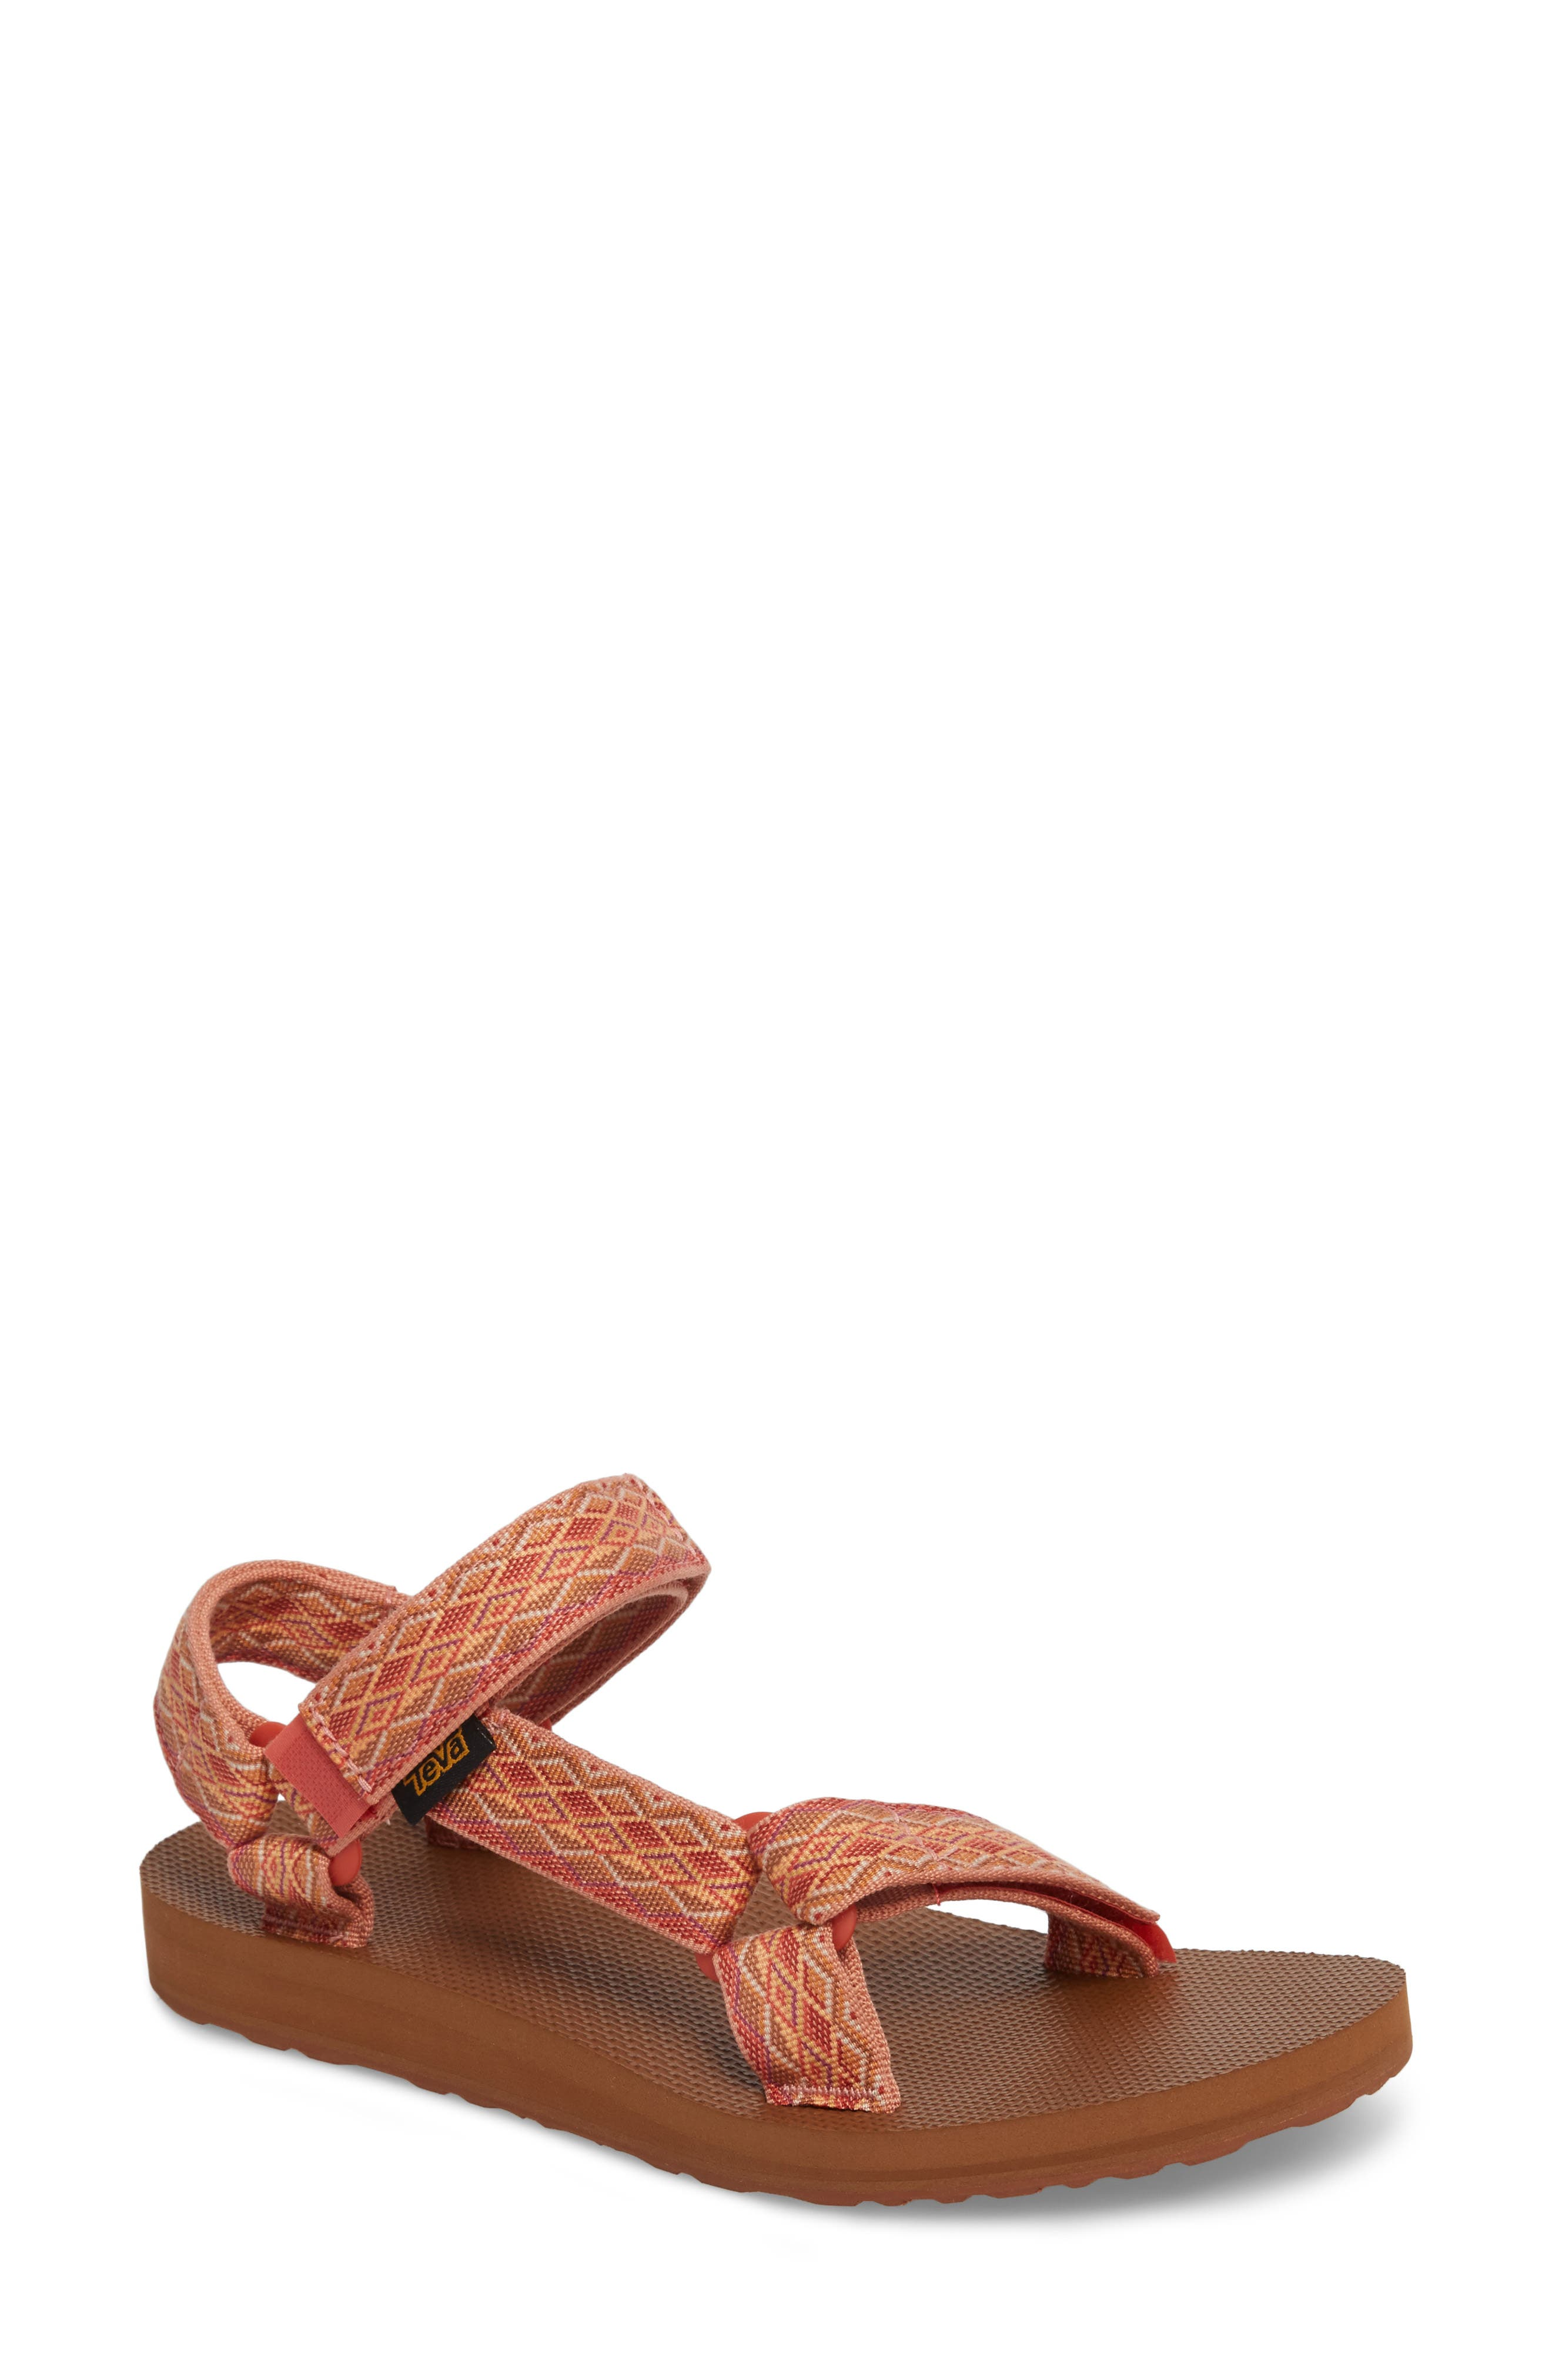 'Original Universal' Sandal,                             Main thumbnail 1, color,                             Mirimar Fade Coral Sand